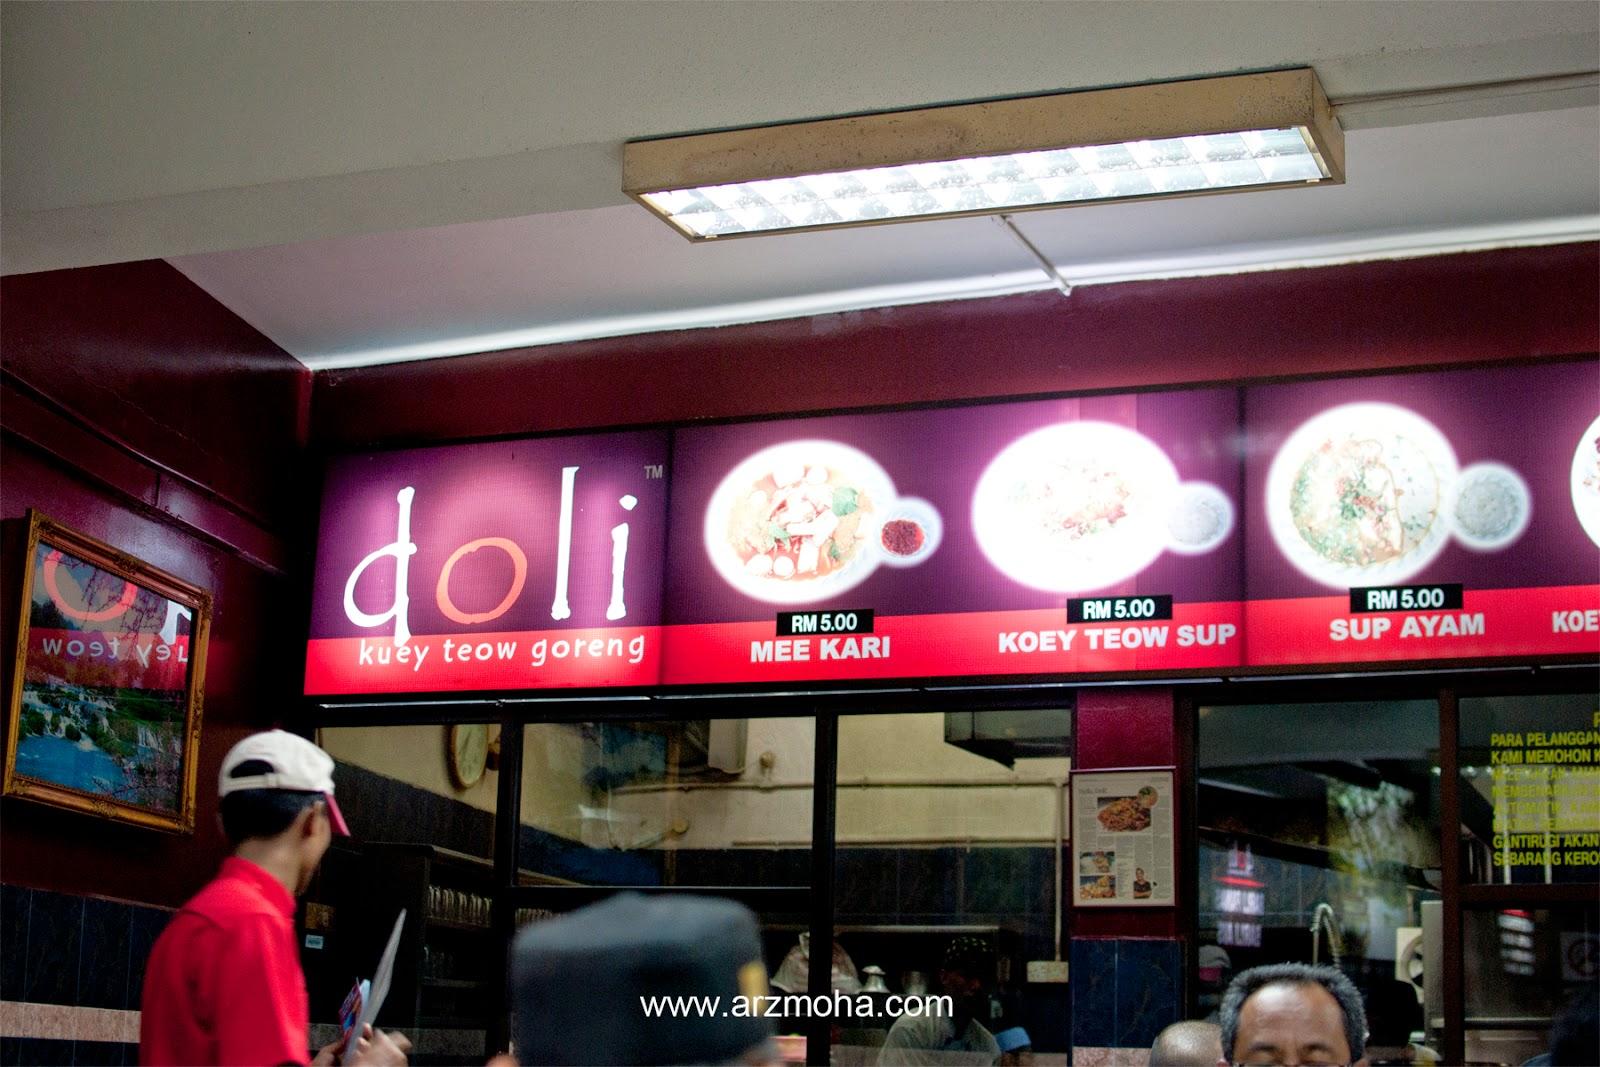 Doli, Kuey Teow Goreng, Sedap, gambar cantik, Menu, Taiping, Visit Malaysia